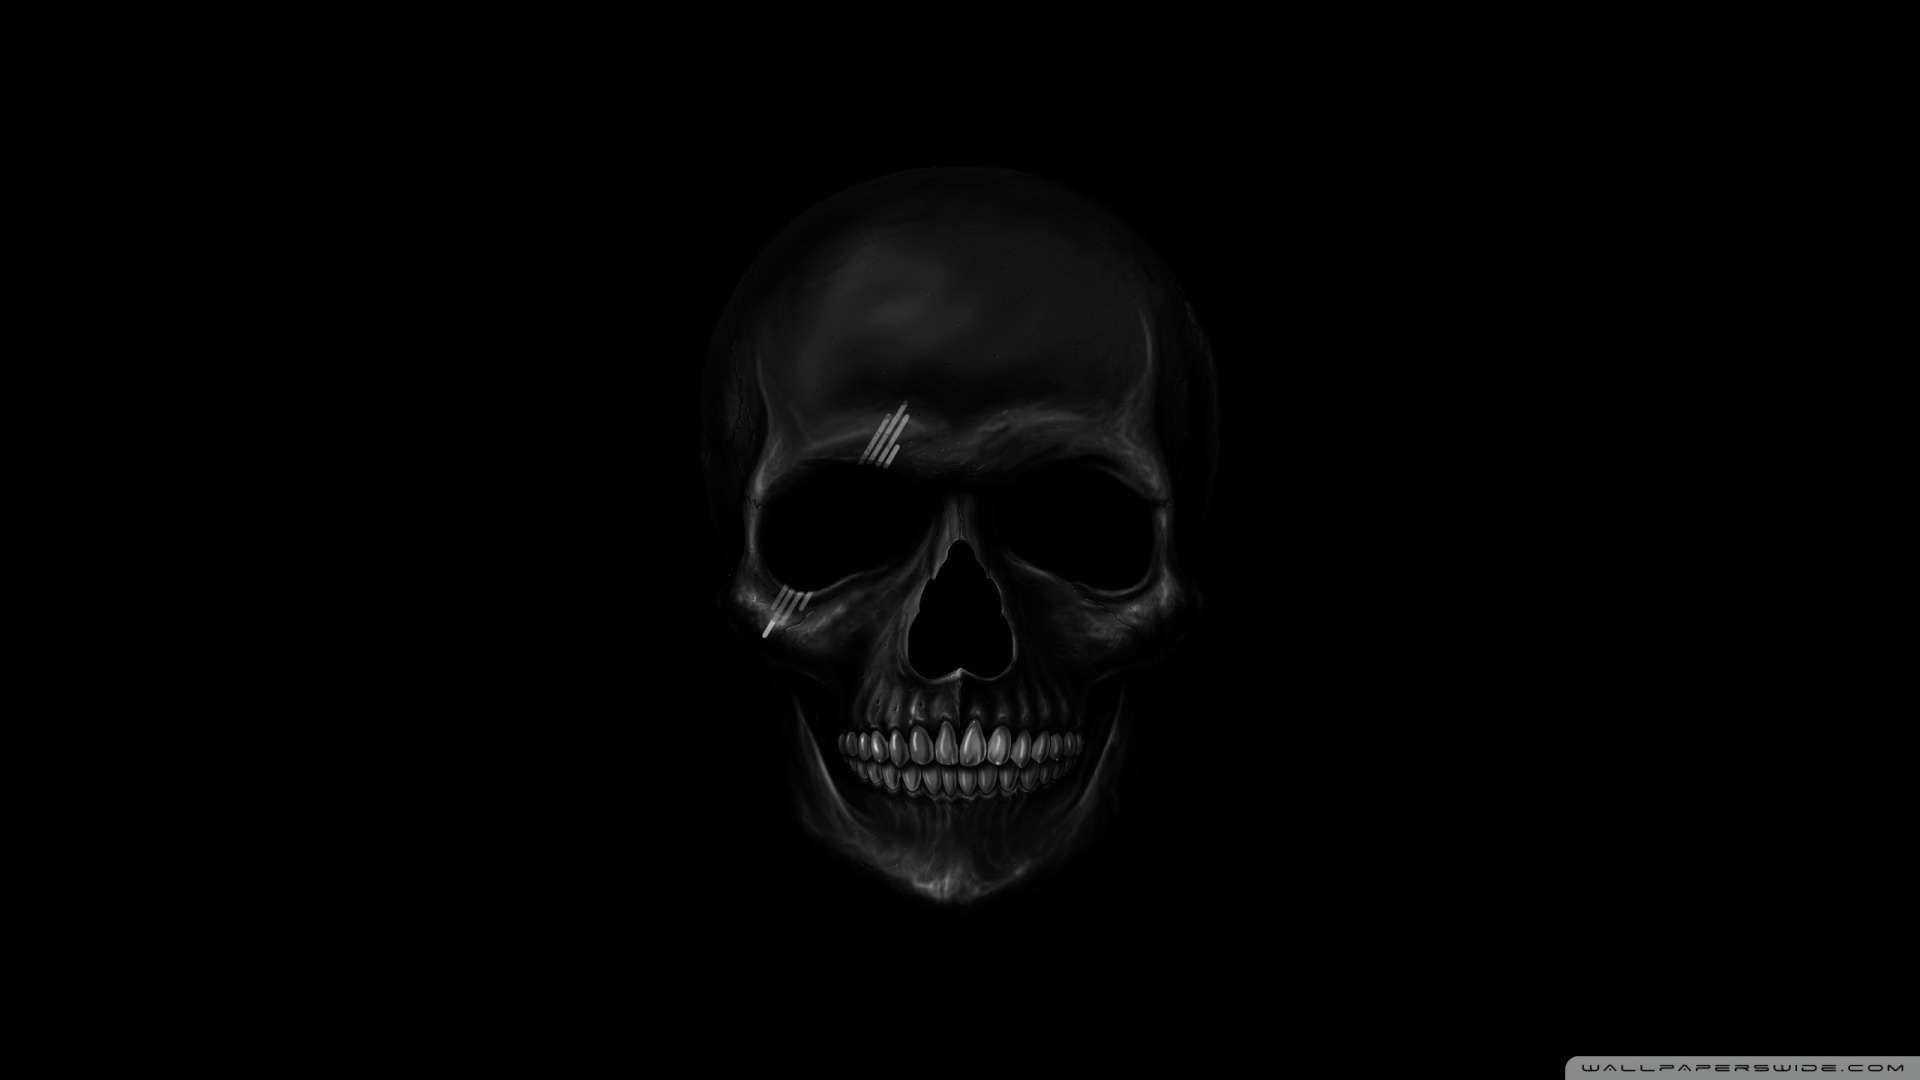 Dark Black Wallpapers Top Free Dark Black Backgrounds Wallpaperaccess